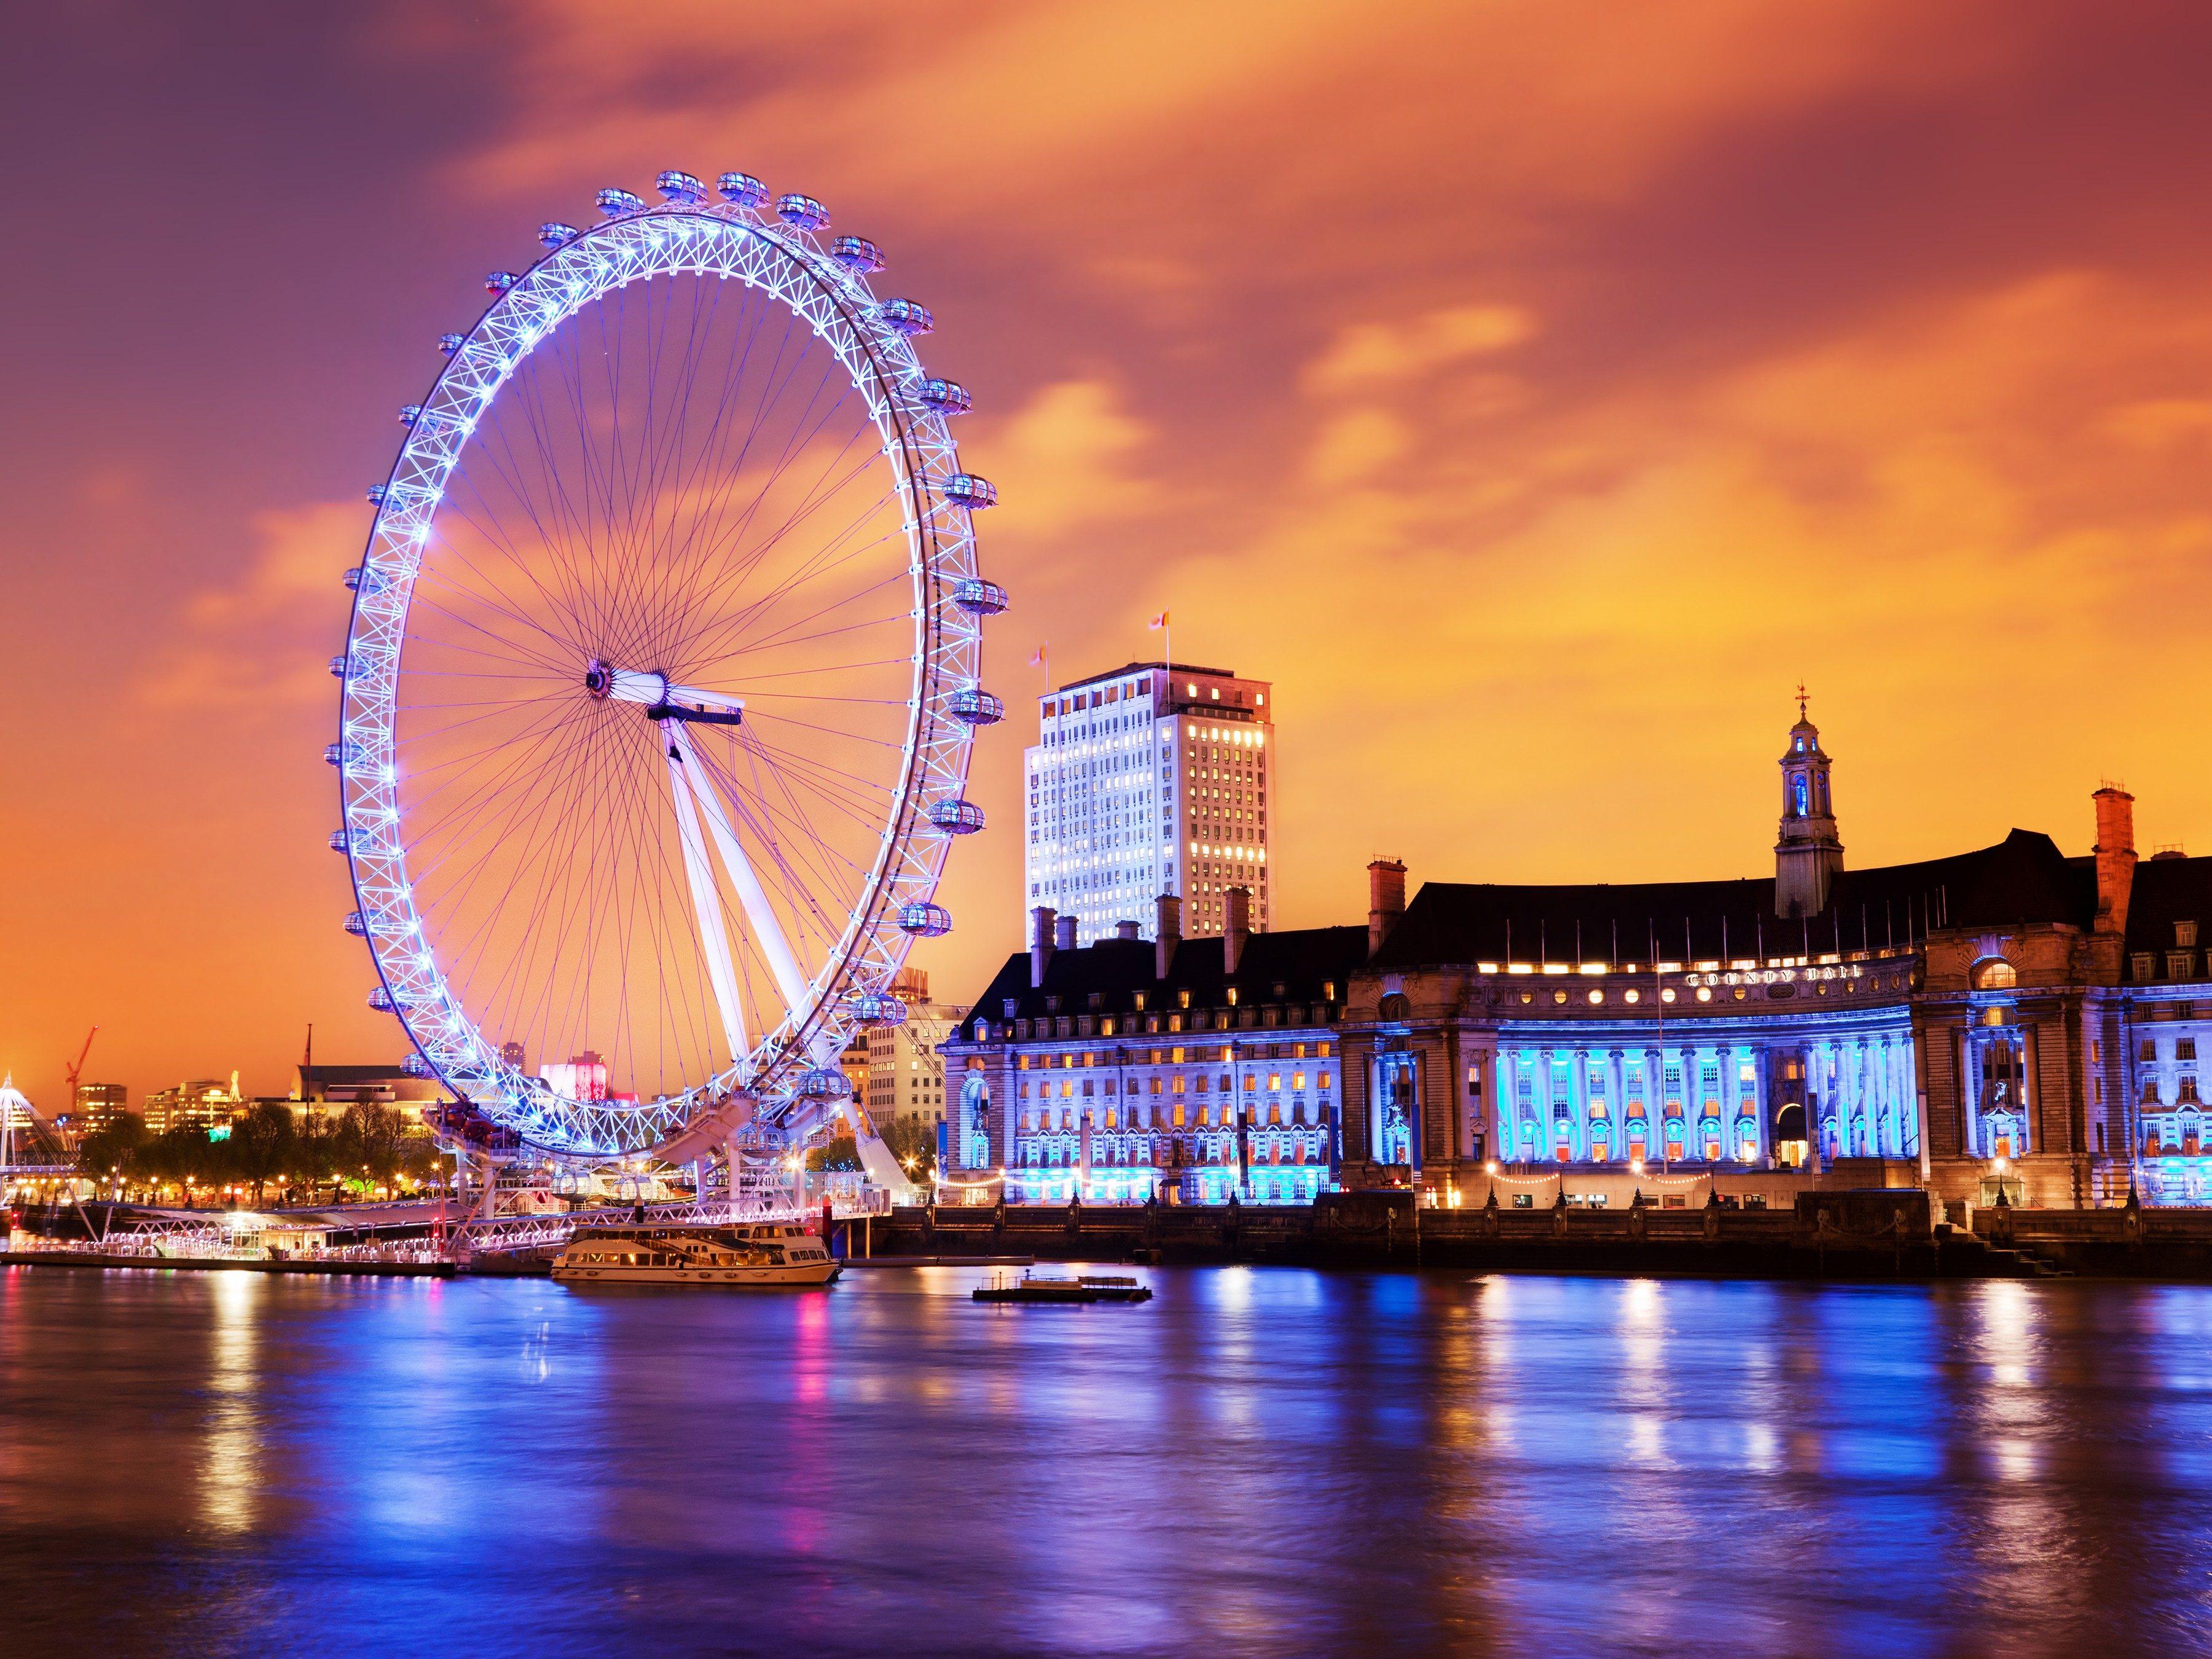 17. London Eye